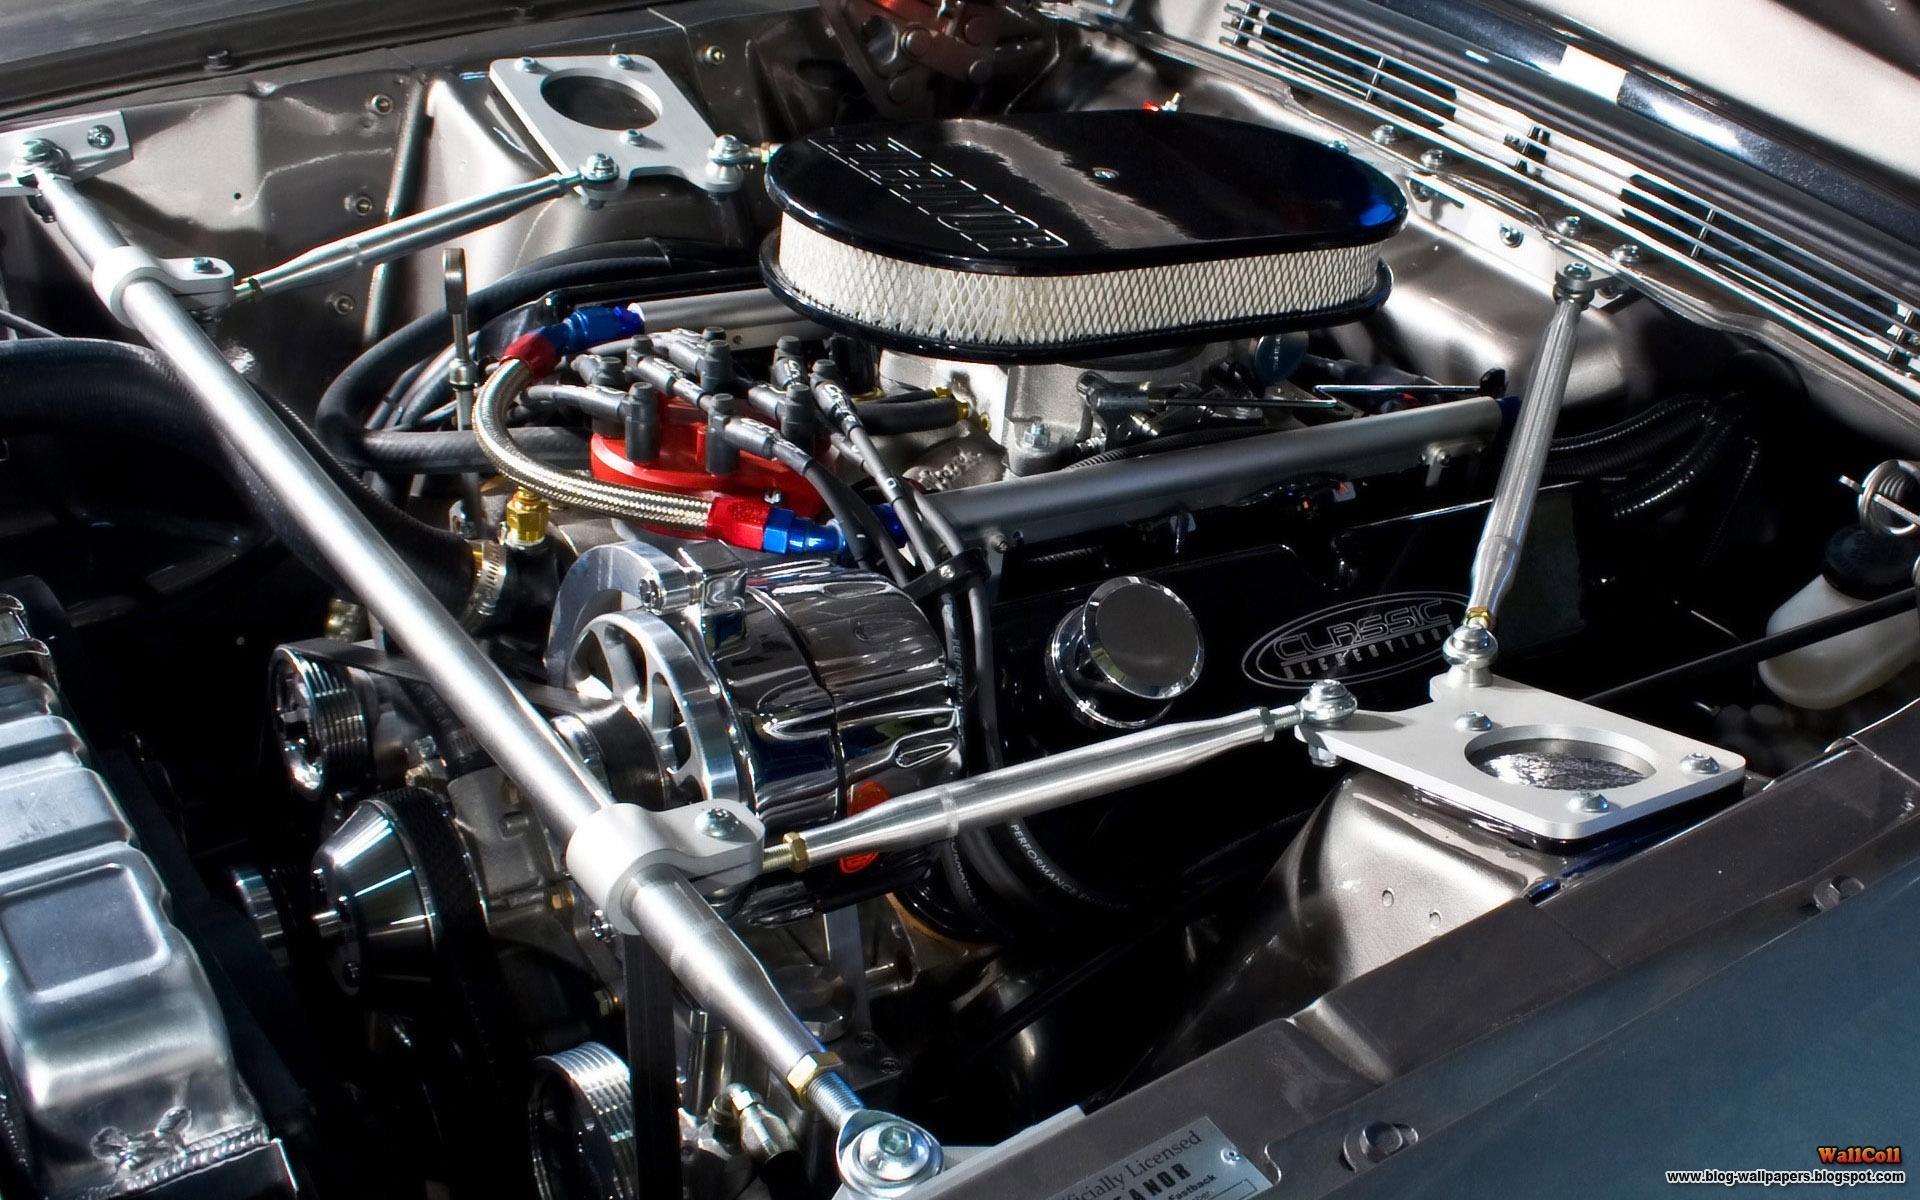 Shelby Mustang Gt500 Eleanor Gone In 60 Seconds Hd